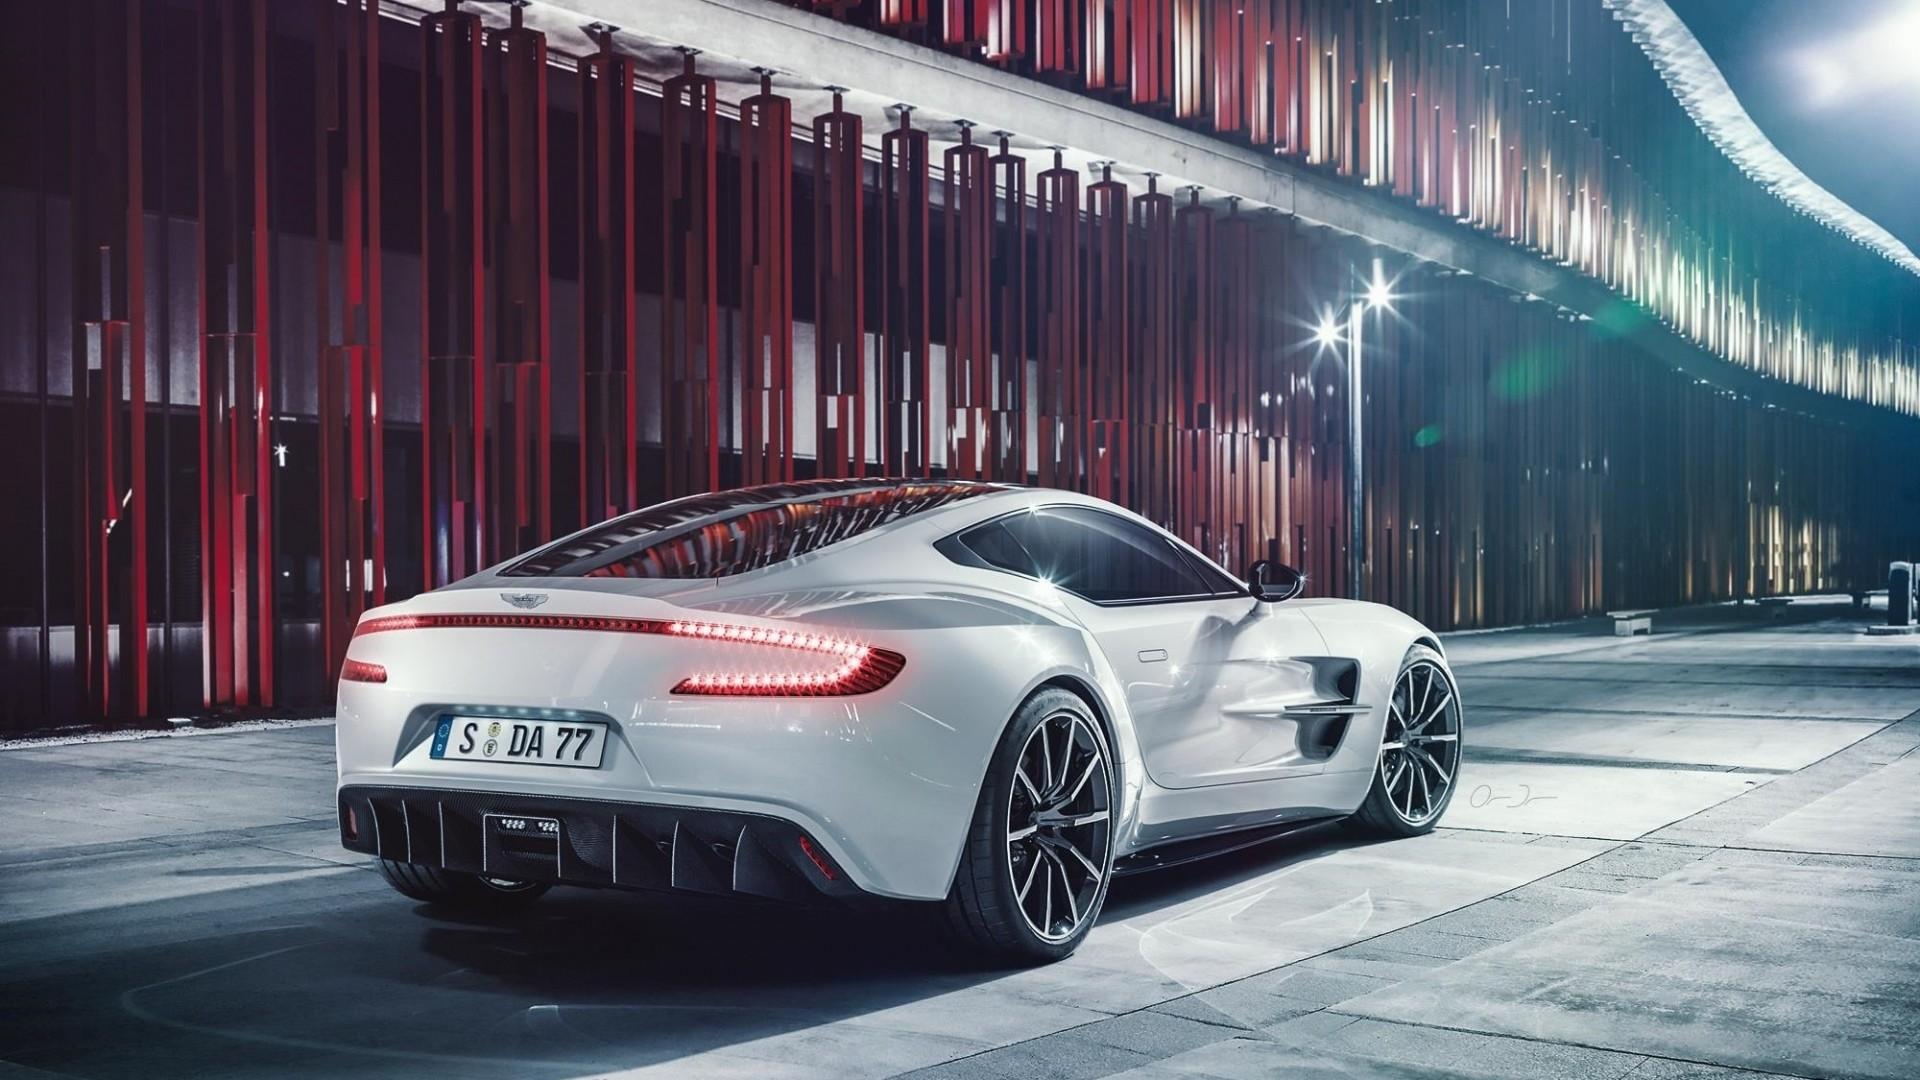 Aston Martin Wallpaper HD 73 images 1920x1080